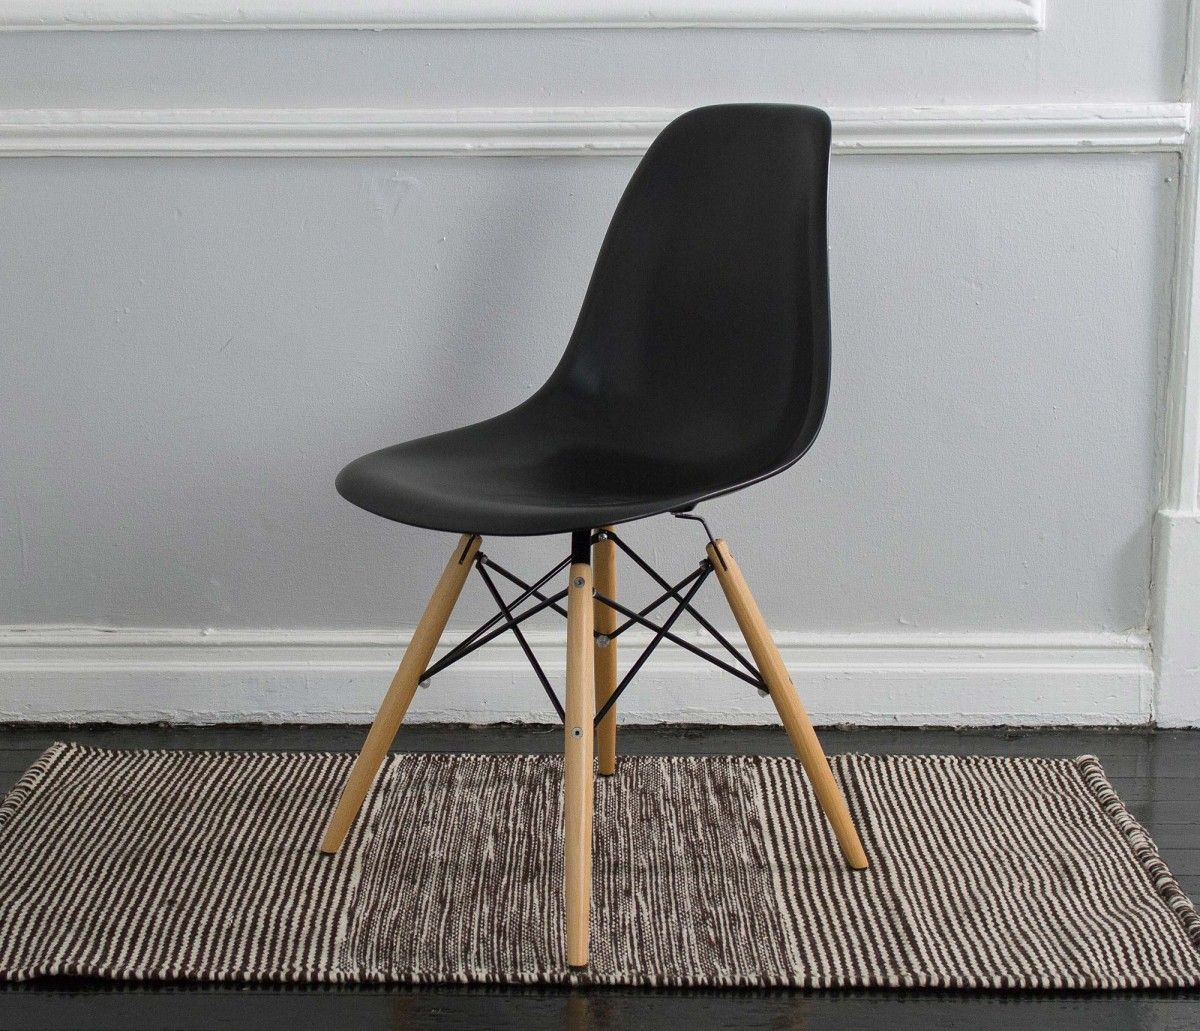 Silla Replica Eames - Sentarse - Muebles | Ideas | Pinterest | Eames ...